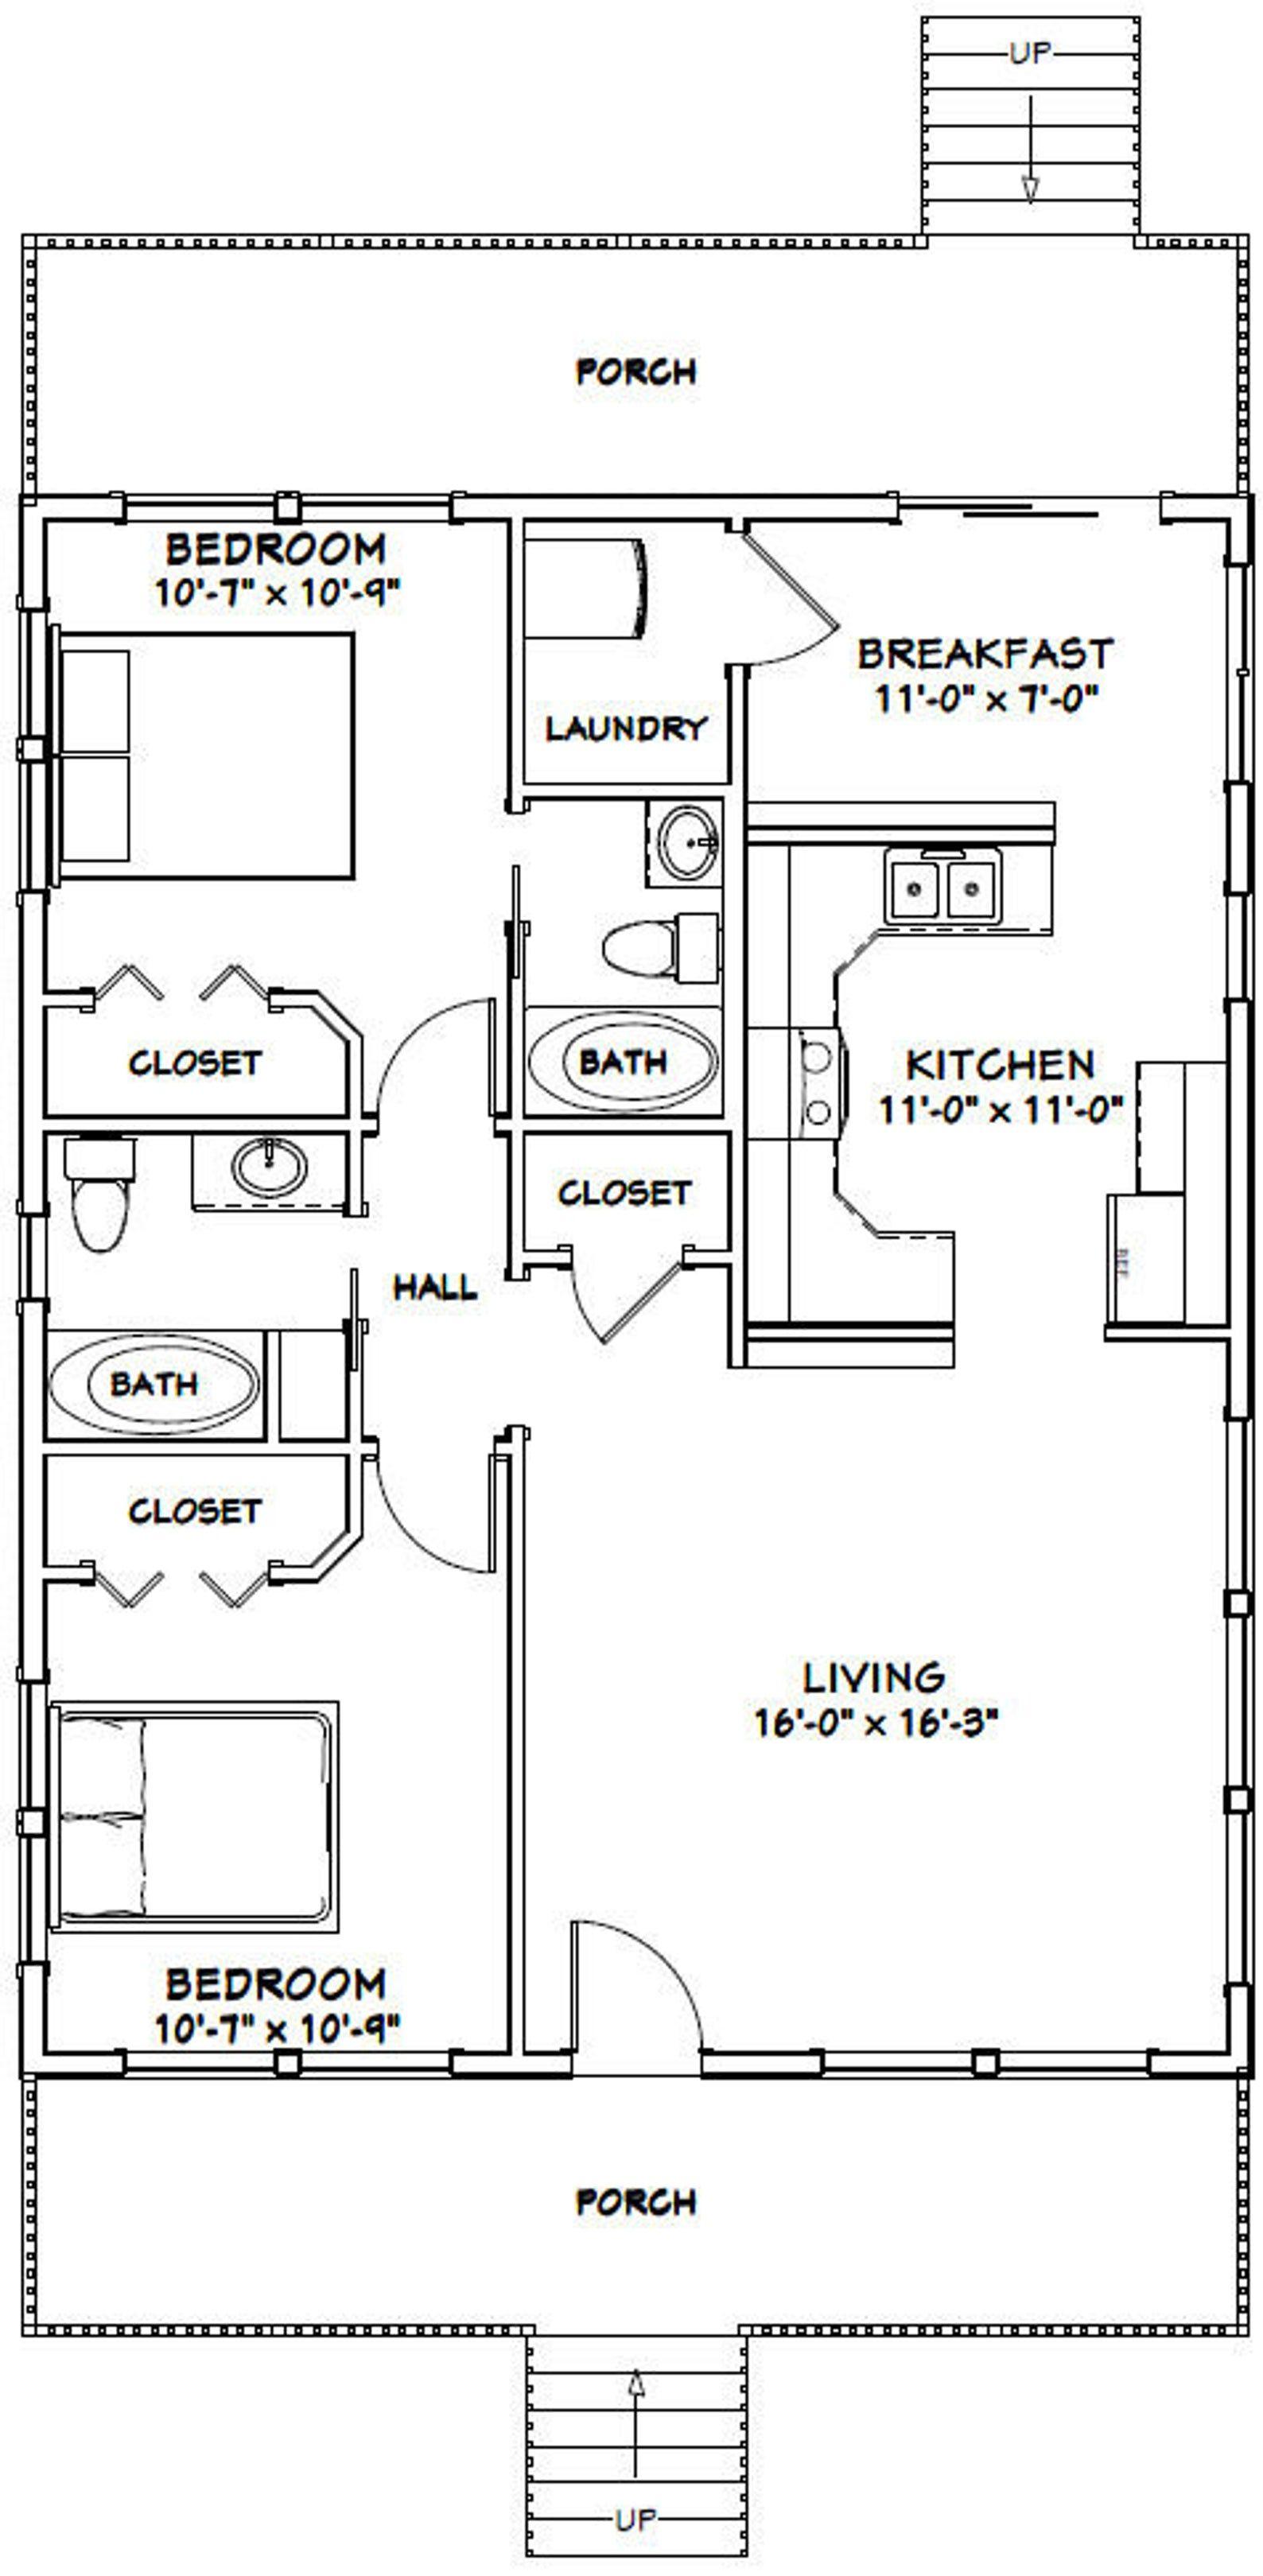 28x36 House 2 Bedroom 2 Bath 1008 Sq Ft Pdf Floor Etsy In 2021 Small House Floor Plans House Plans Ranch House Plans